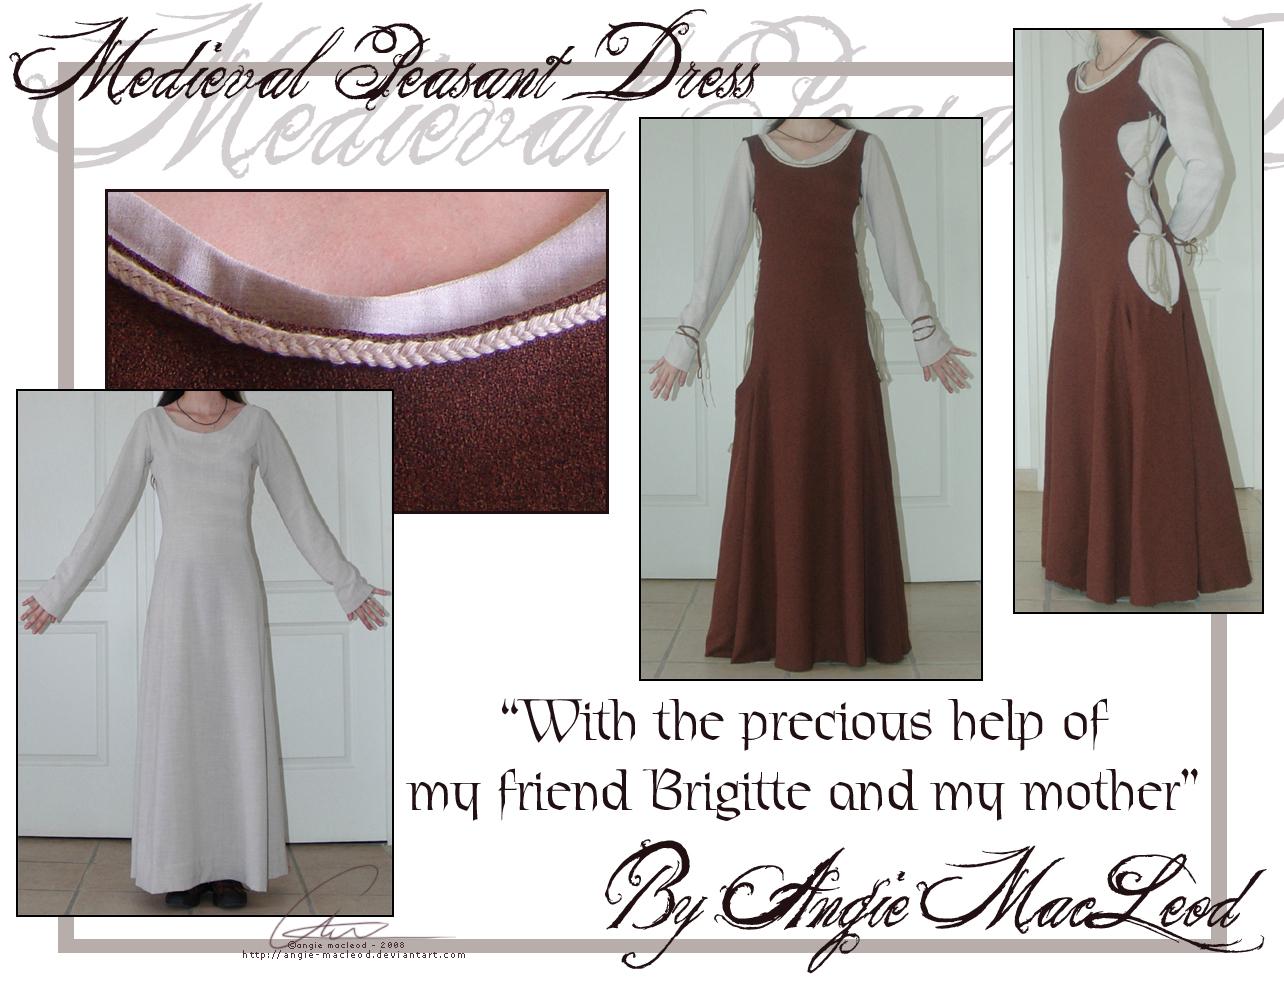 medieval peasant dress by valkangie on deviantart